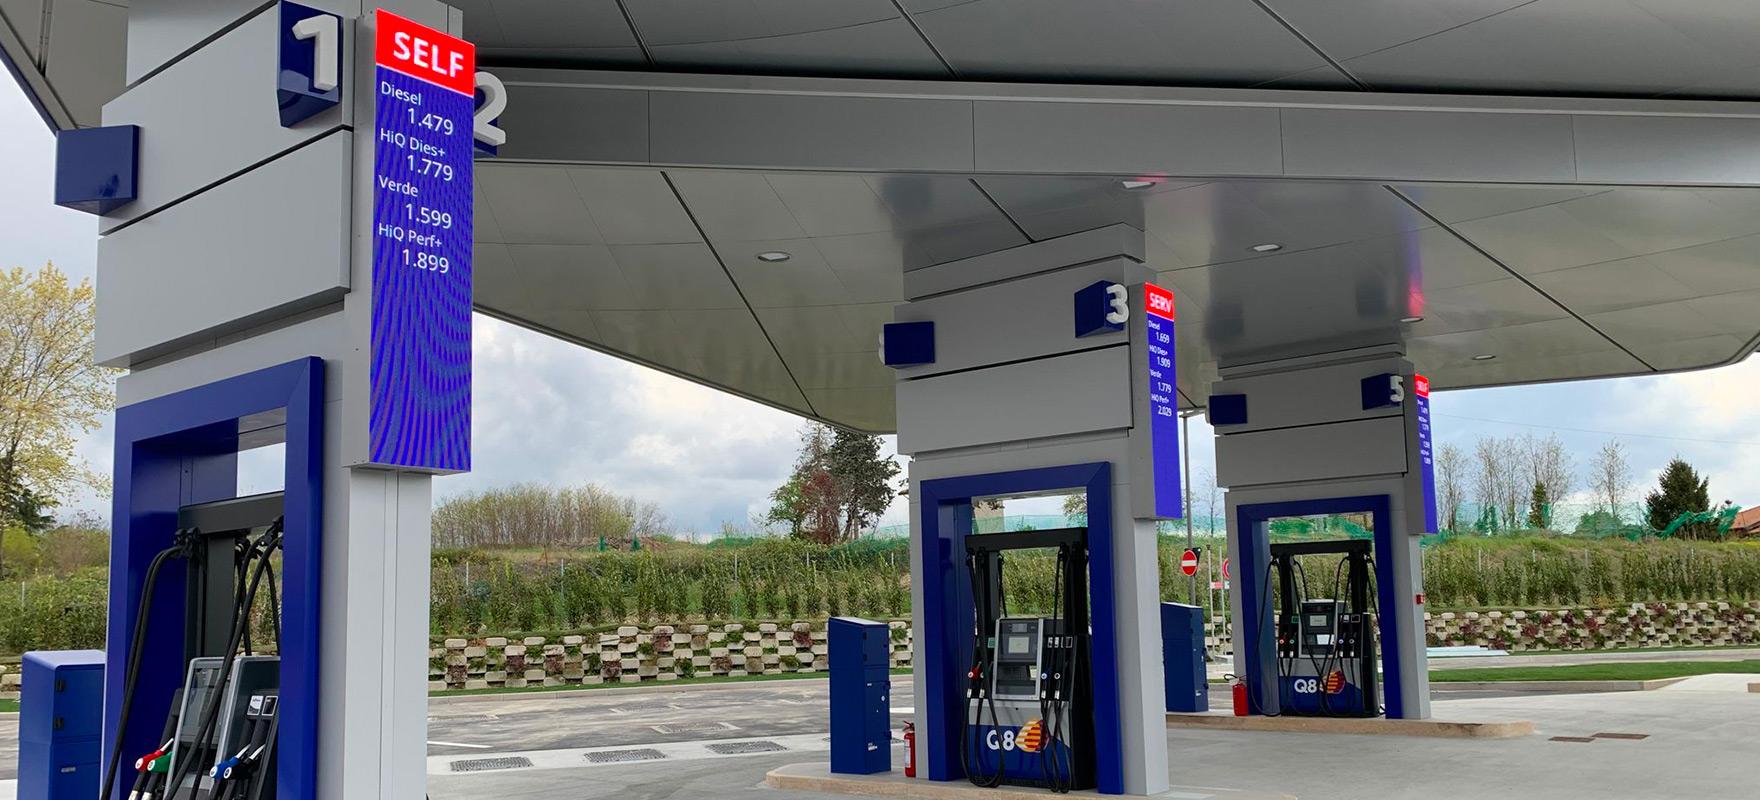 Q8 Ledwall segnaprezzo Schermi led pompe di benzina digital signage DOOH poster digitale